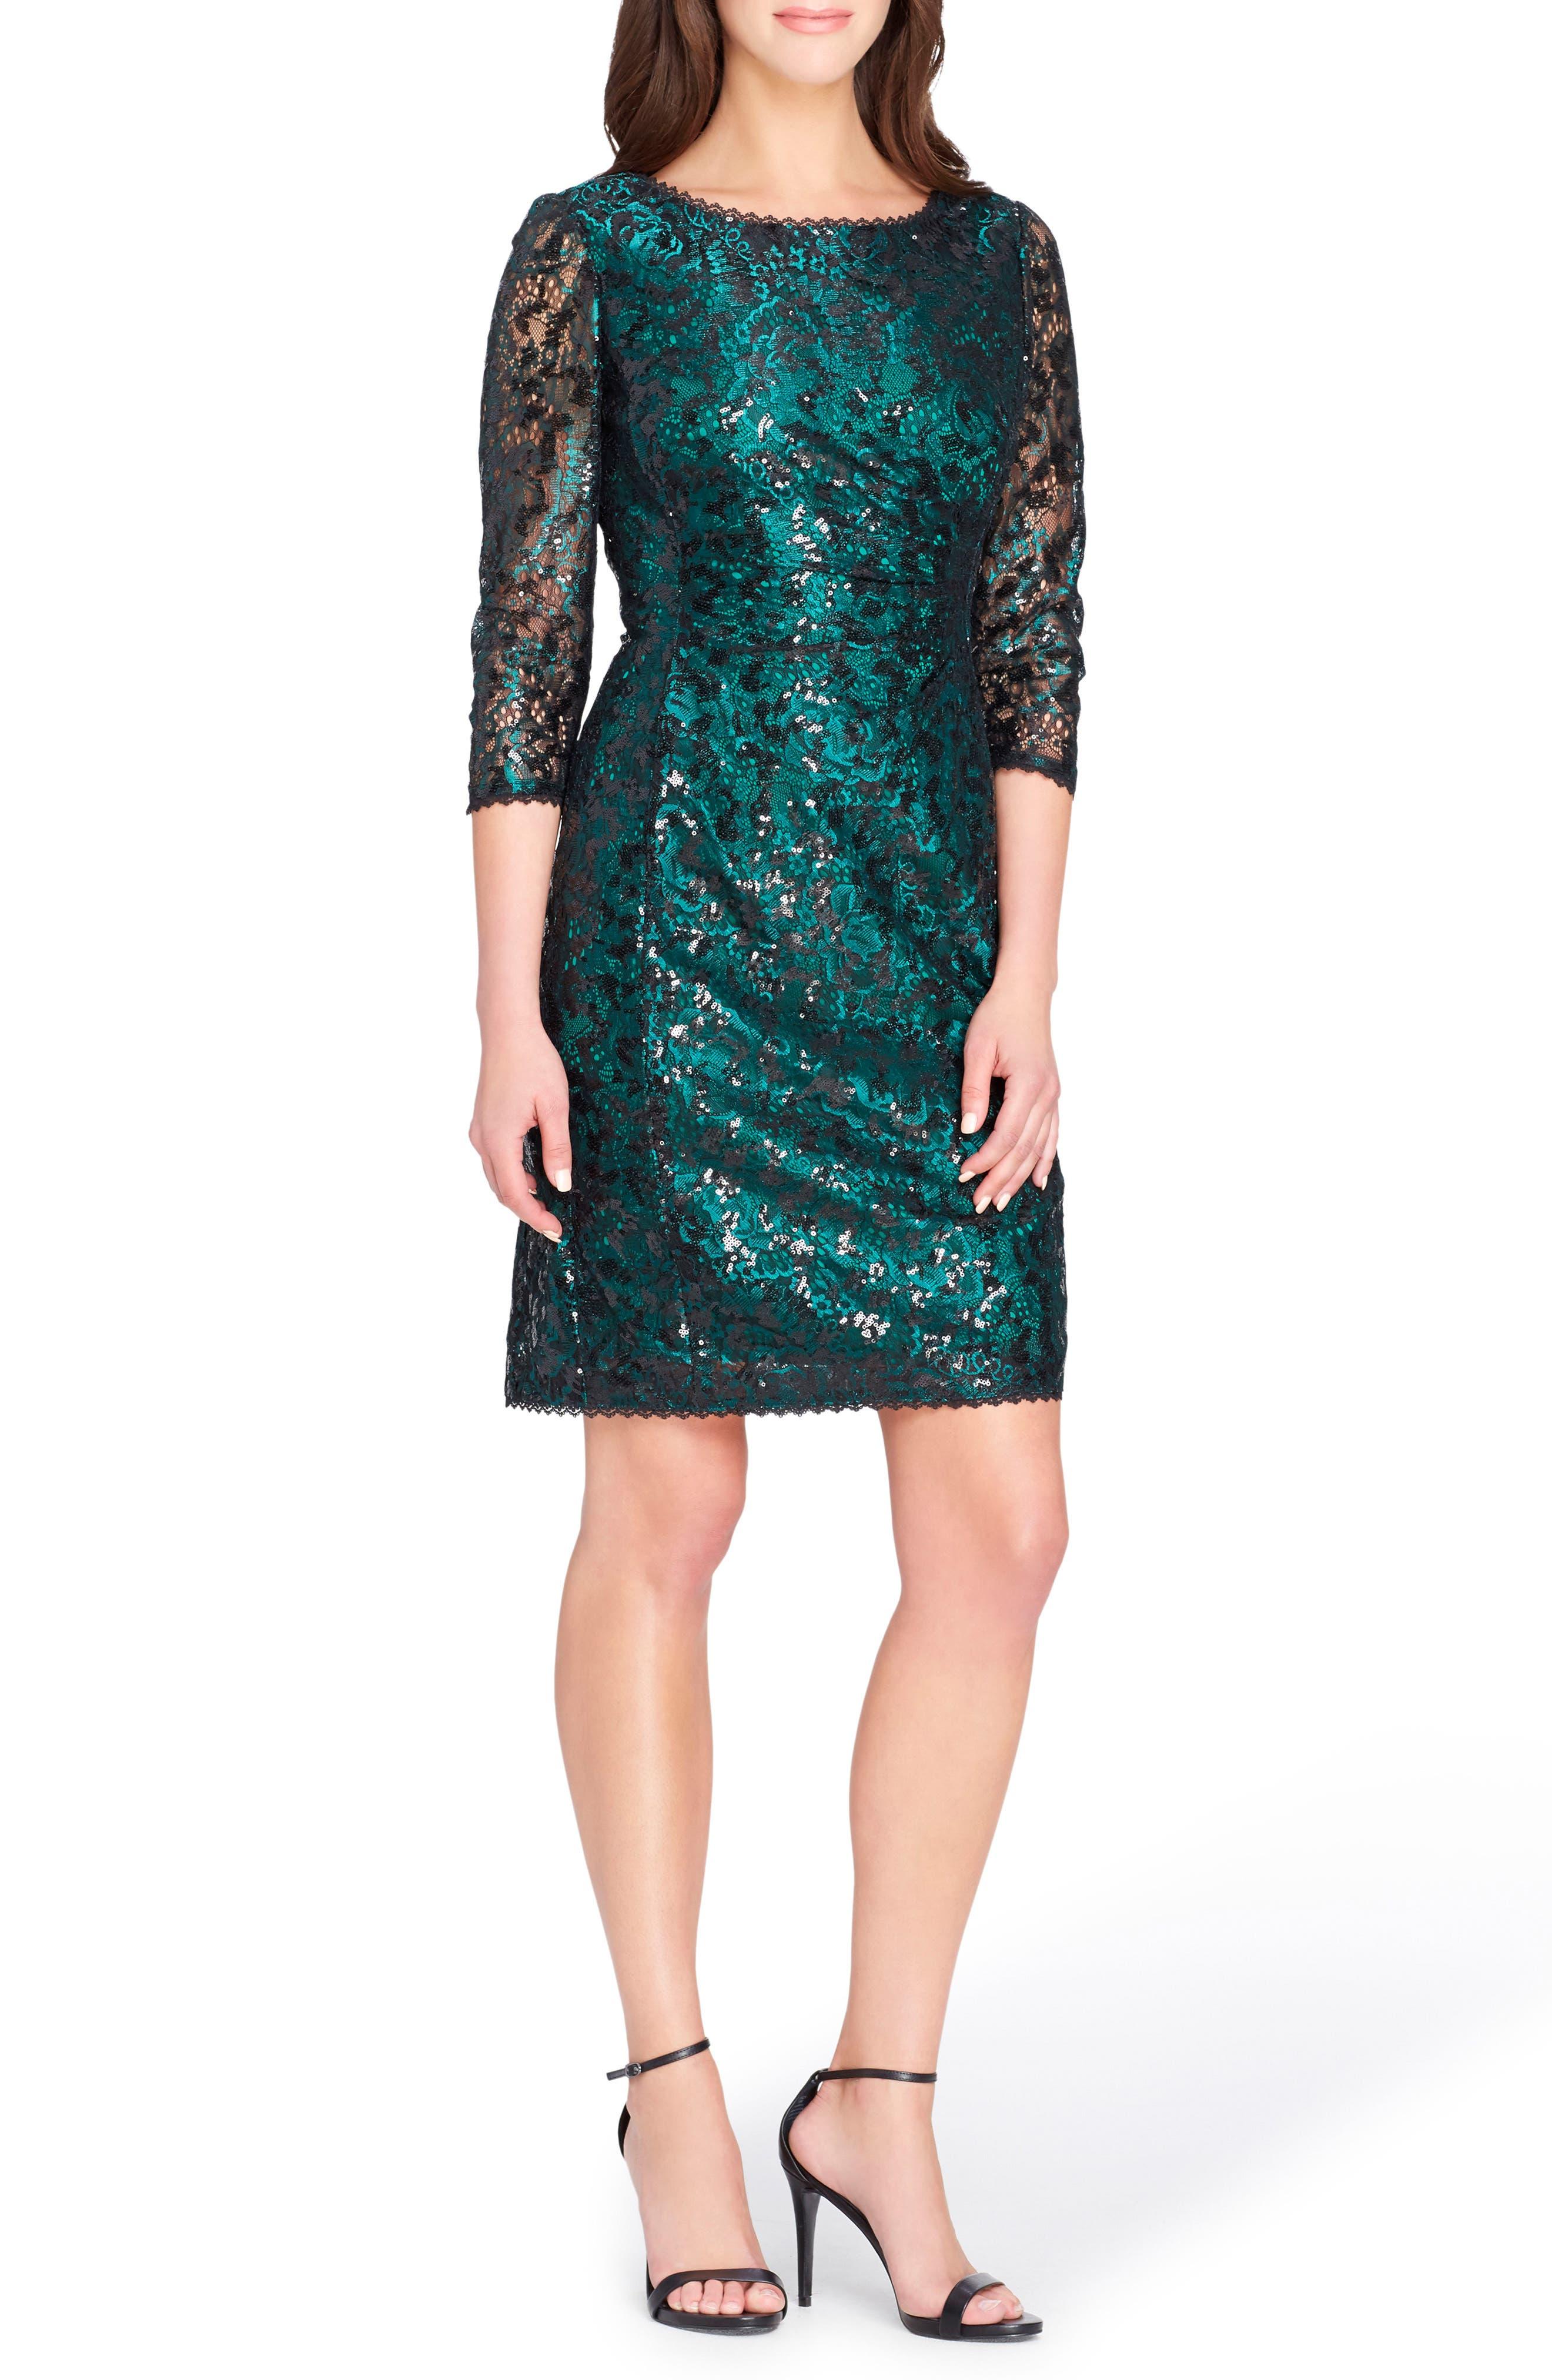 Chemical Lace Sheath Dress,                             Main thumbnail 1, color,                             Emerald Green/ Black